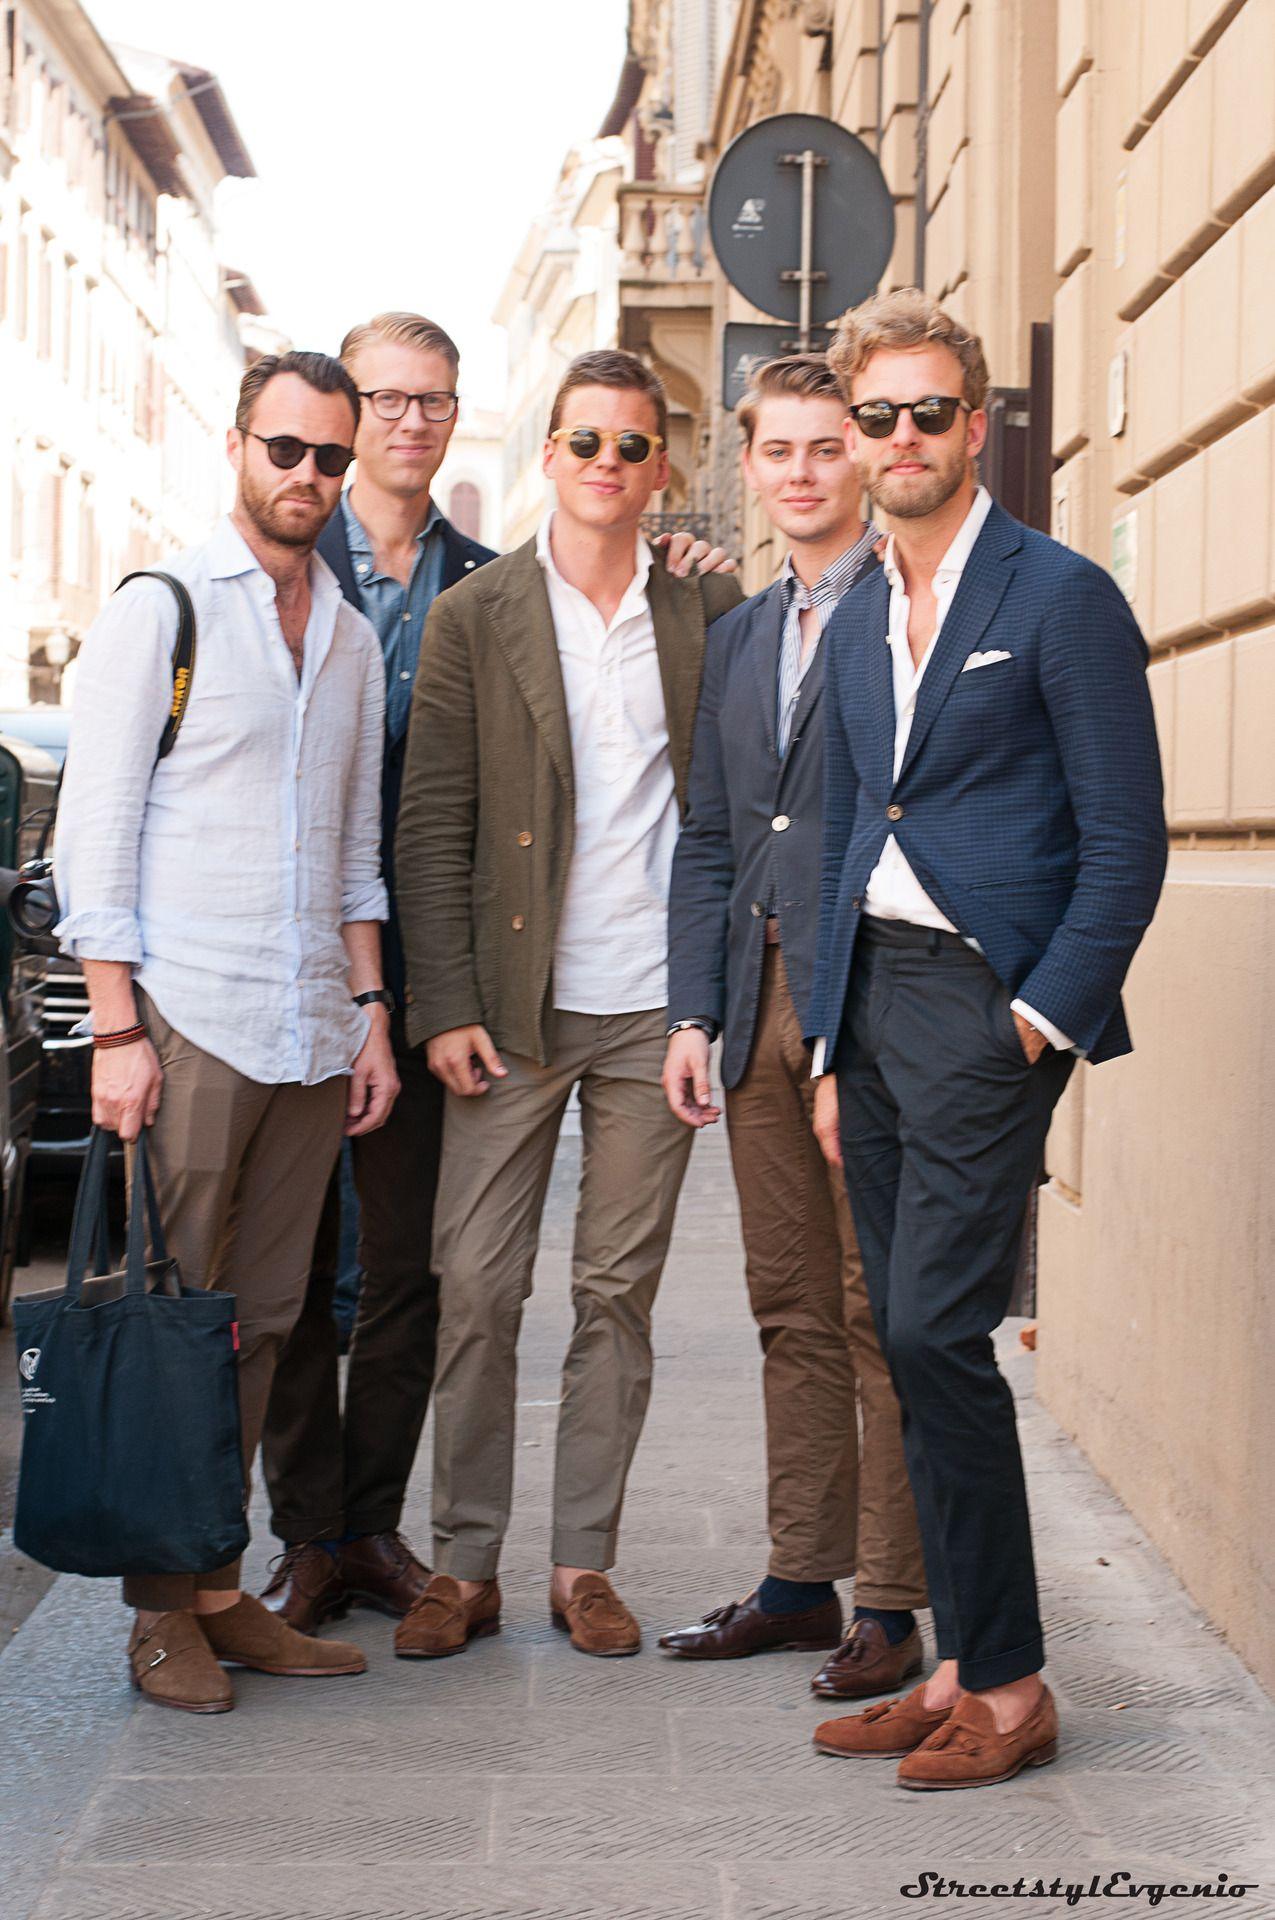 Scandinavian Boys P Xeles Men 39 S Fashion Pinterest Stylish Man